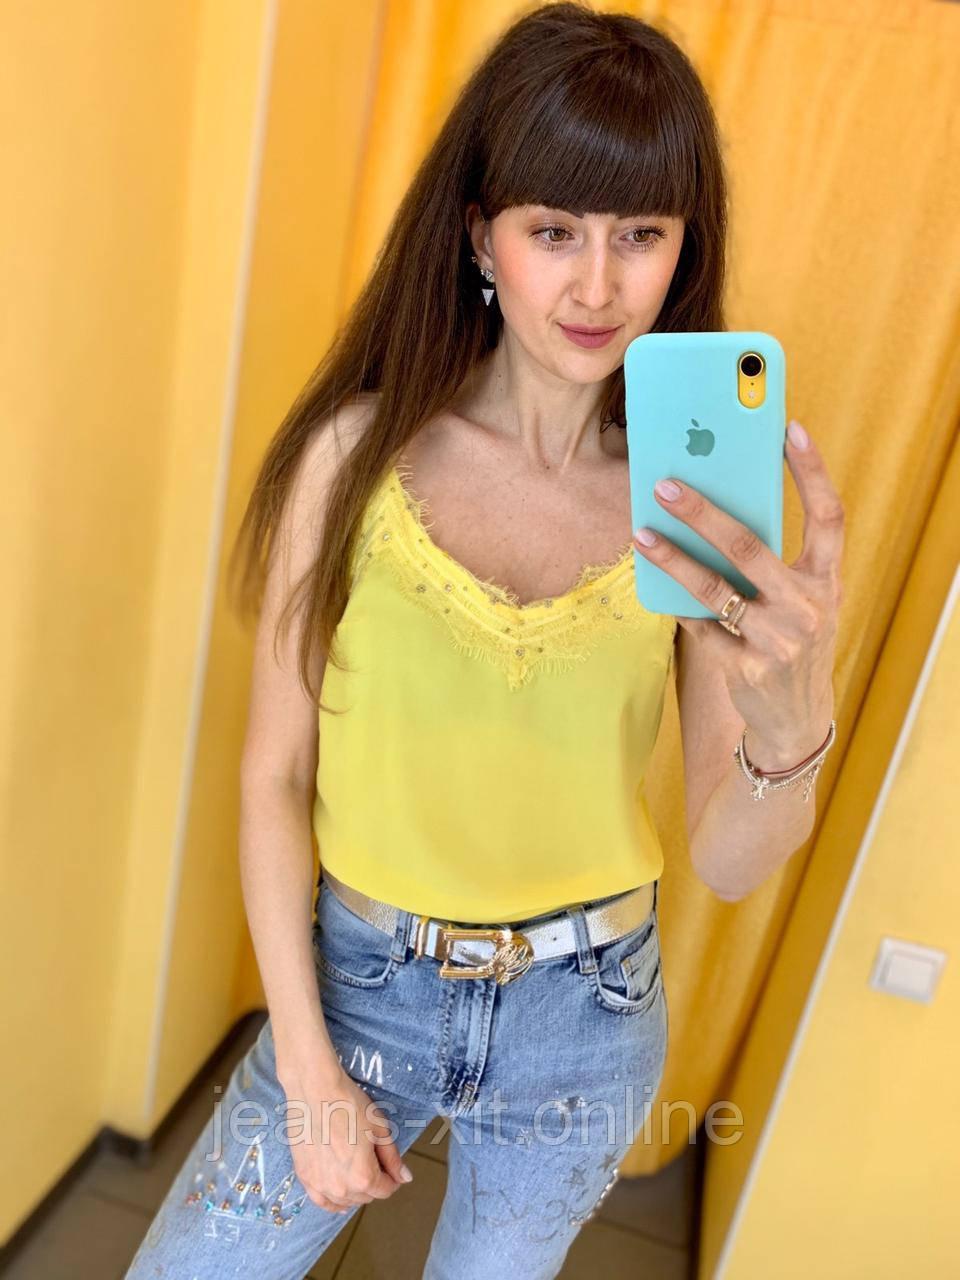 Майка женская 36(р) пудровая 931424880 Phardi Турция Лето-C 36, желтая